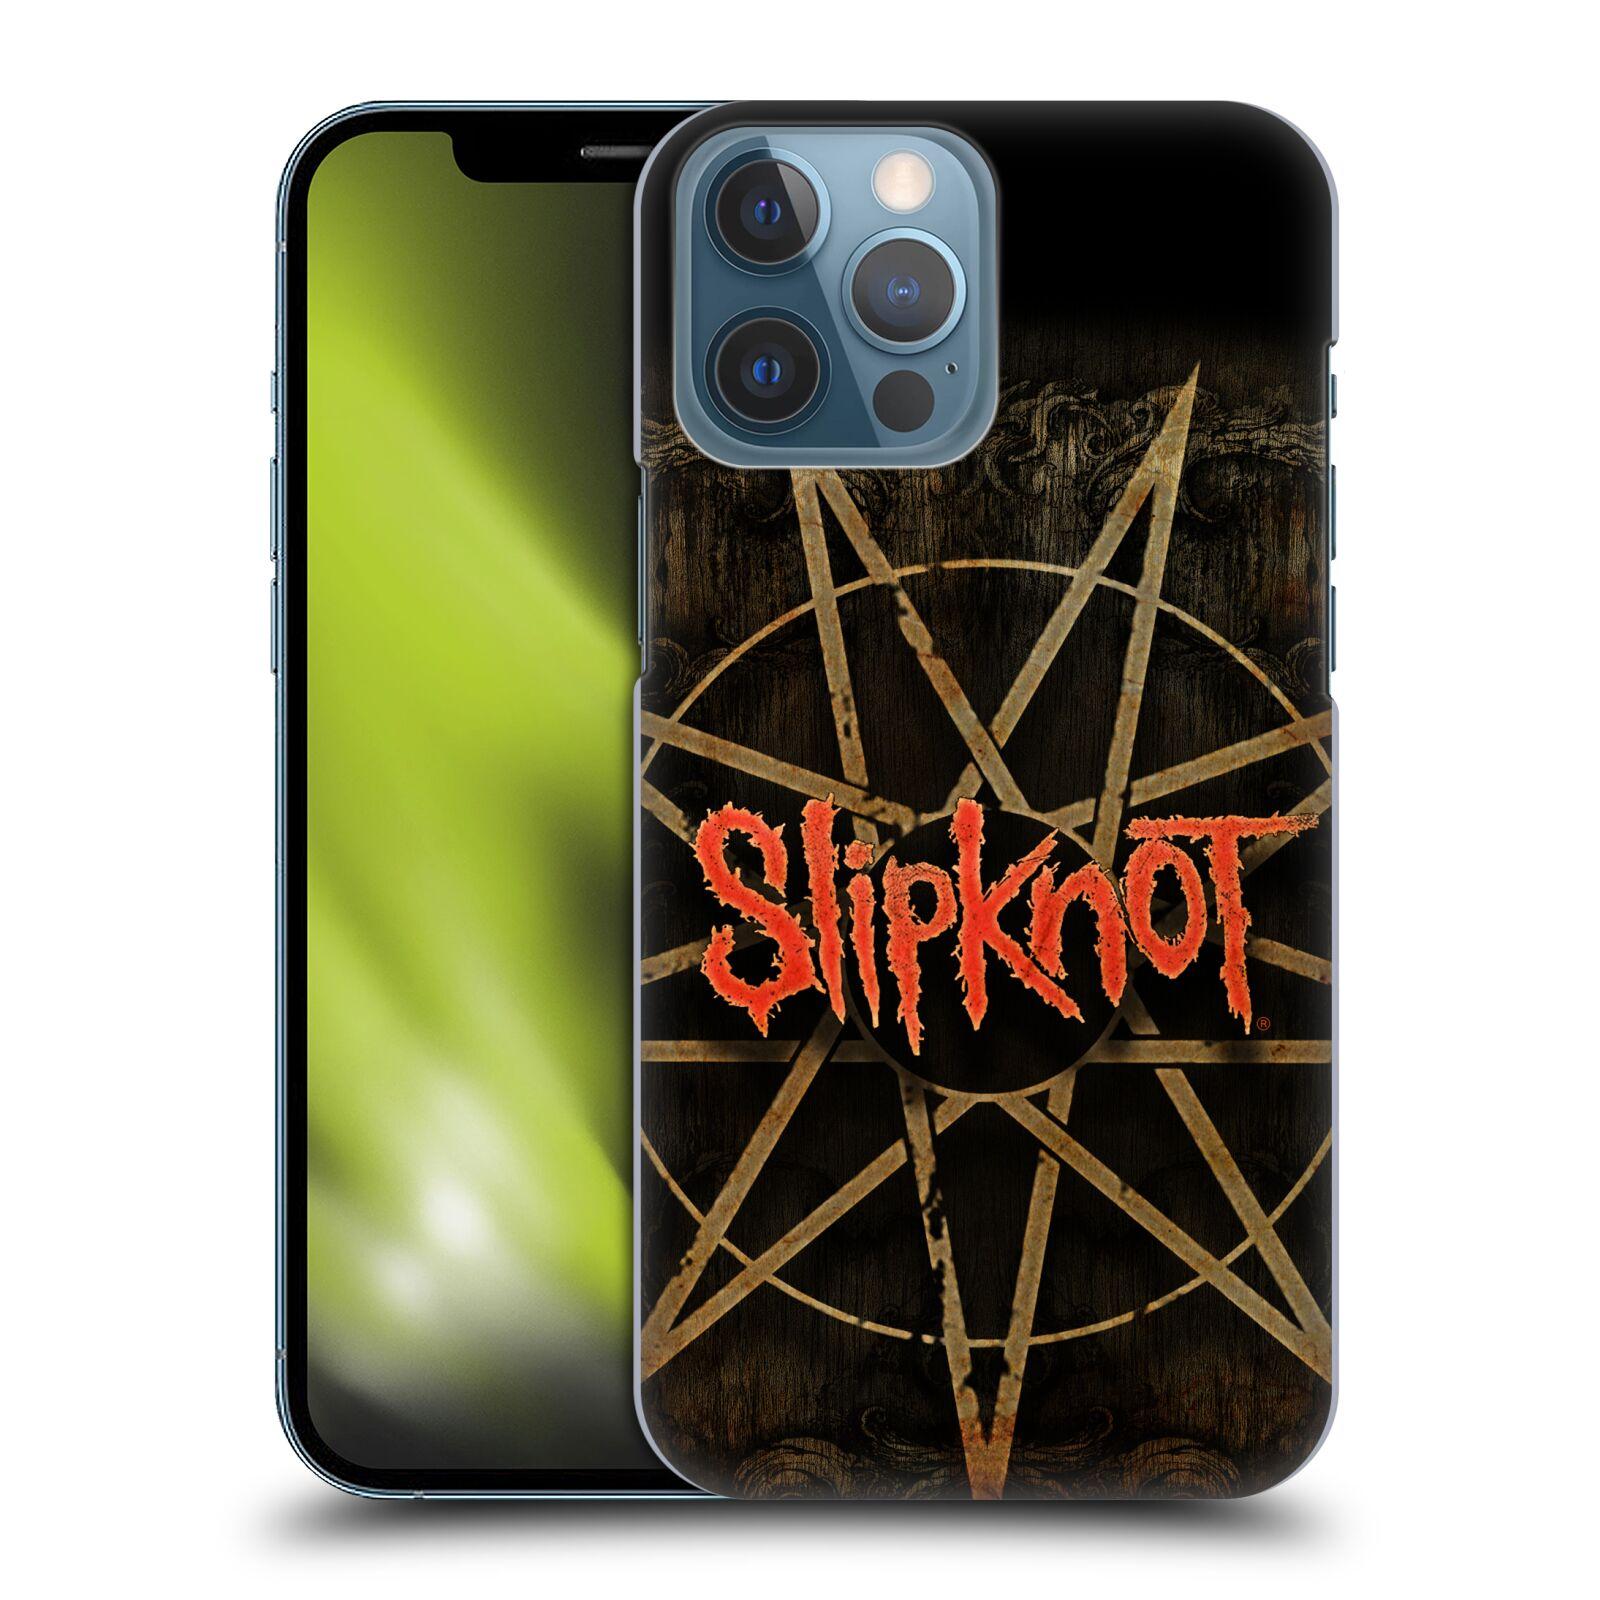 Plastové pouzdro na mobil Apple iPhone 13 Pro Max - Head Case - Slipknot - Znak